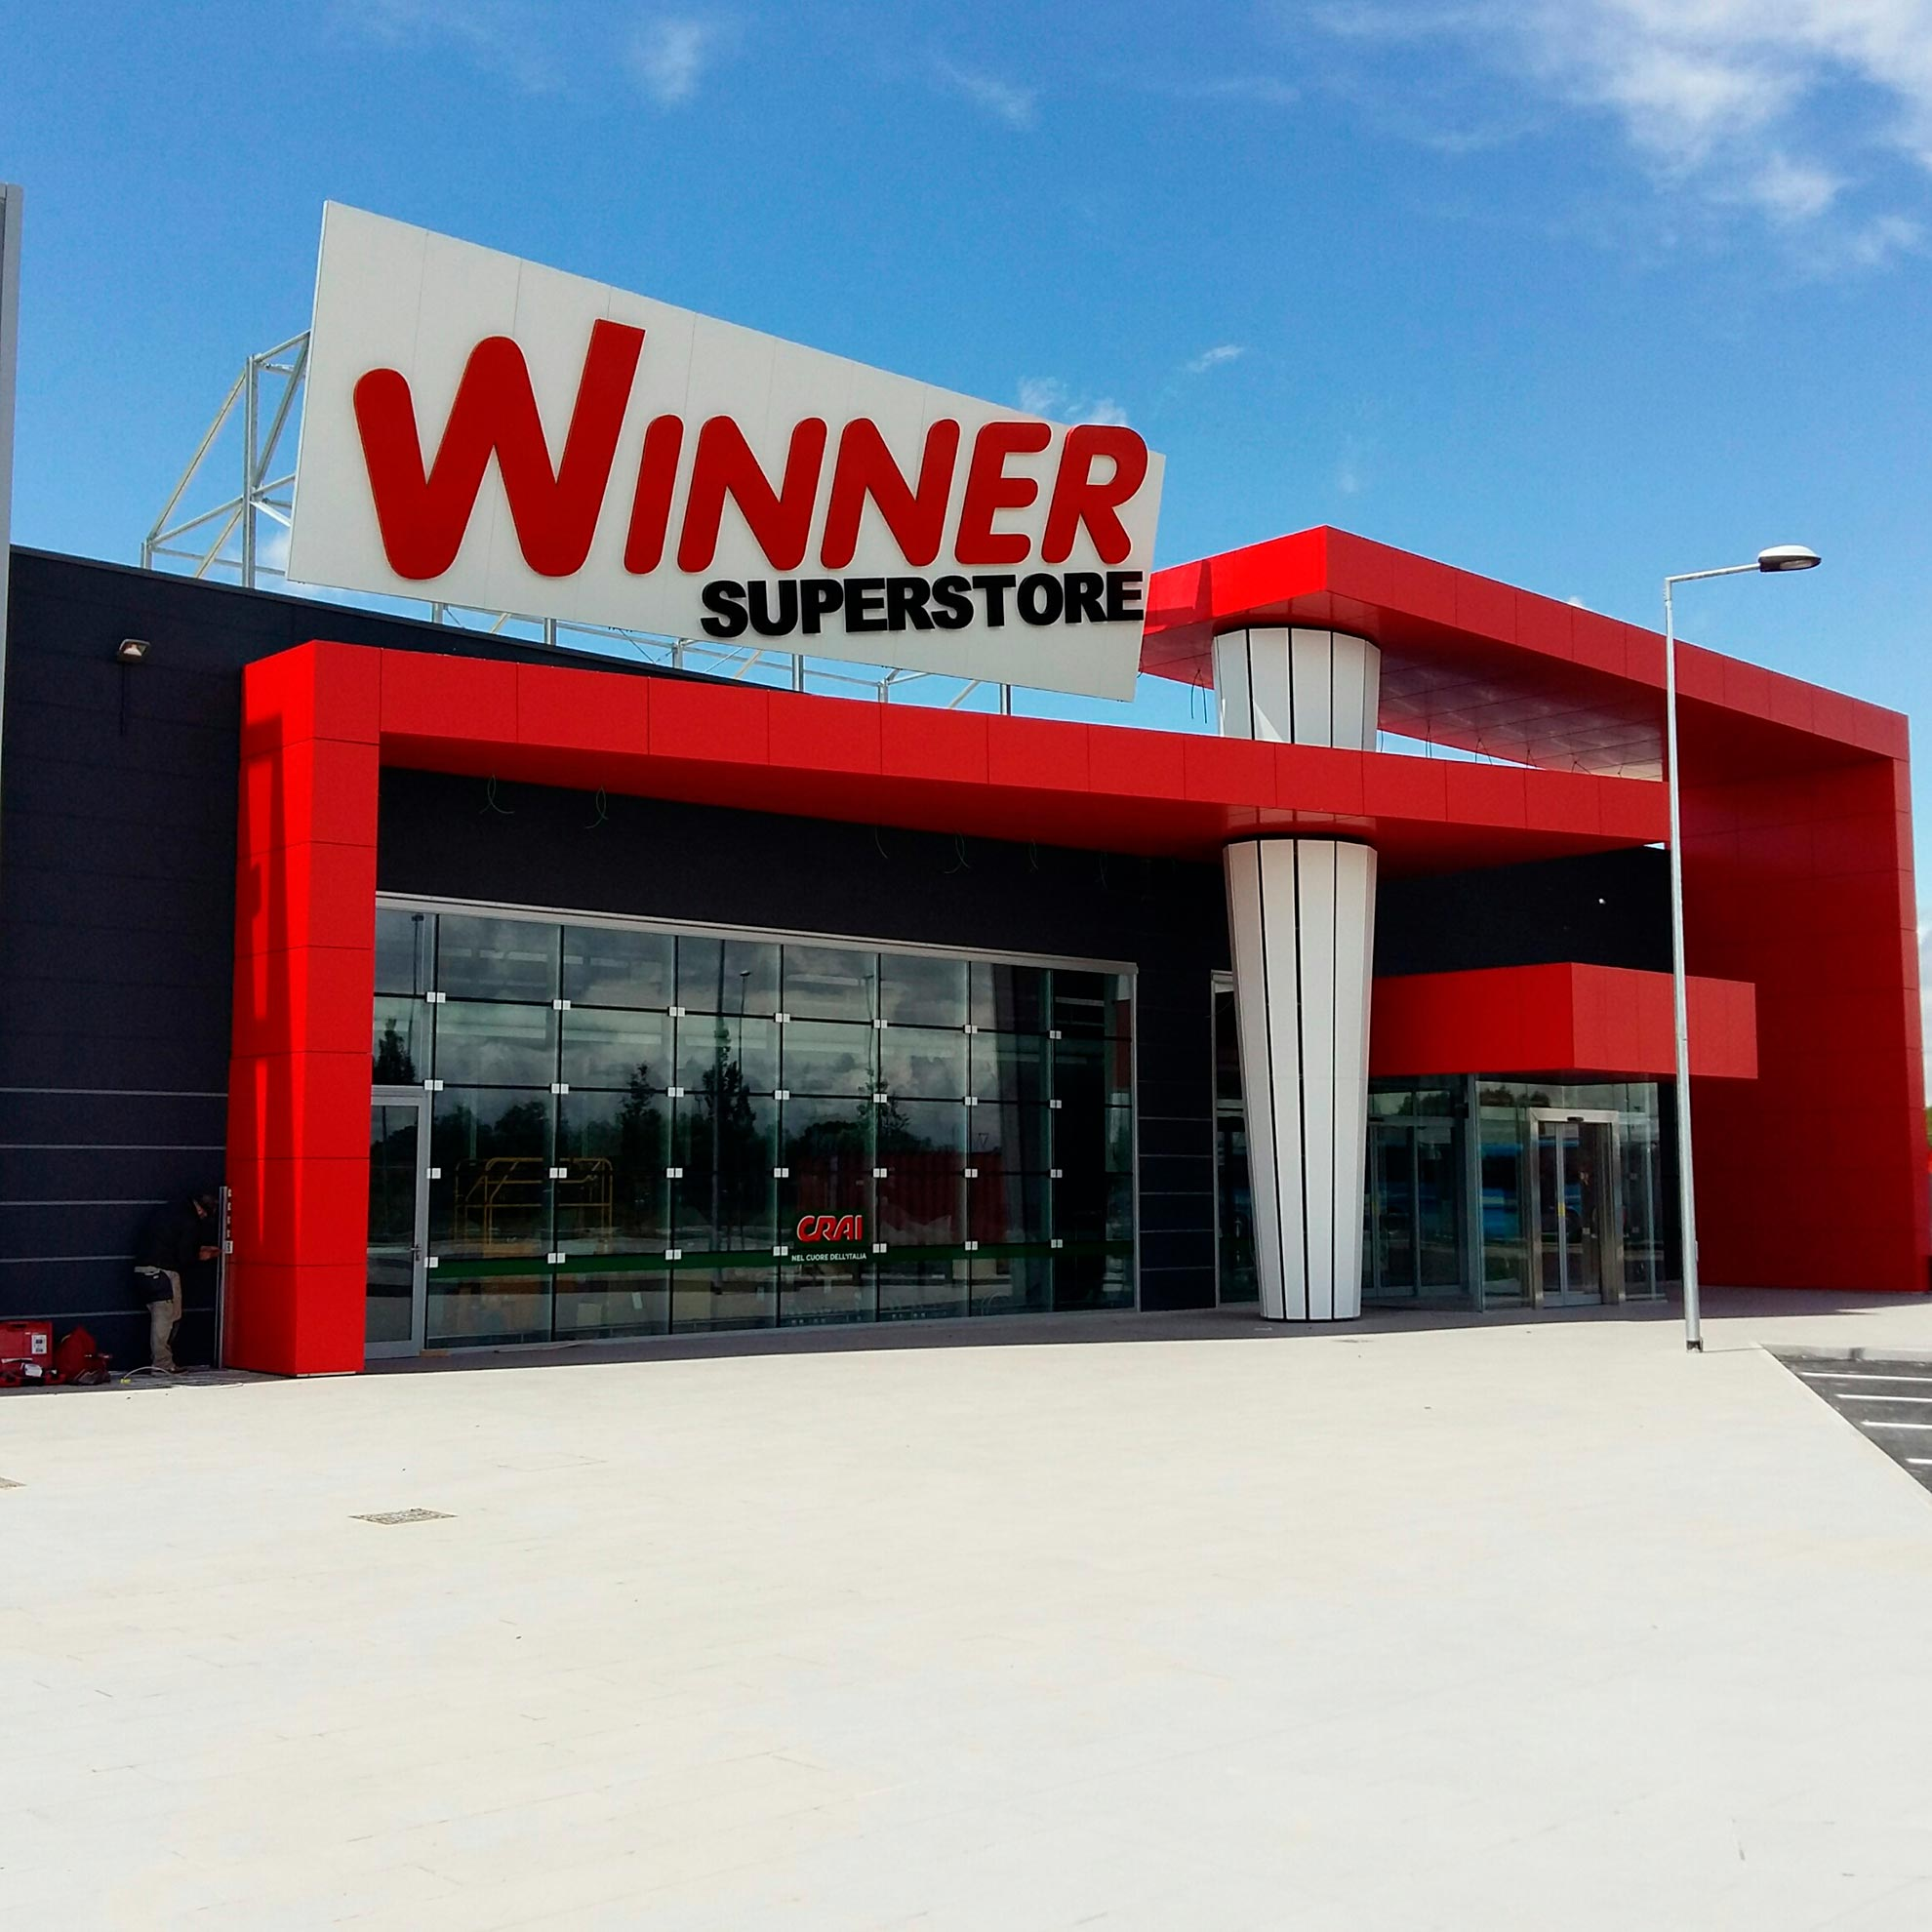 Supermercado-Winner-Superstore.-Venecia-Italia.-larson--2_1591964847.jpg